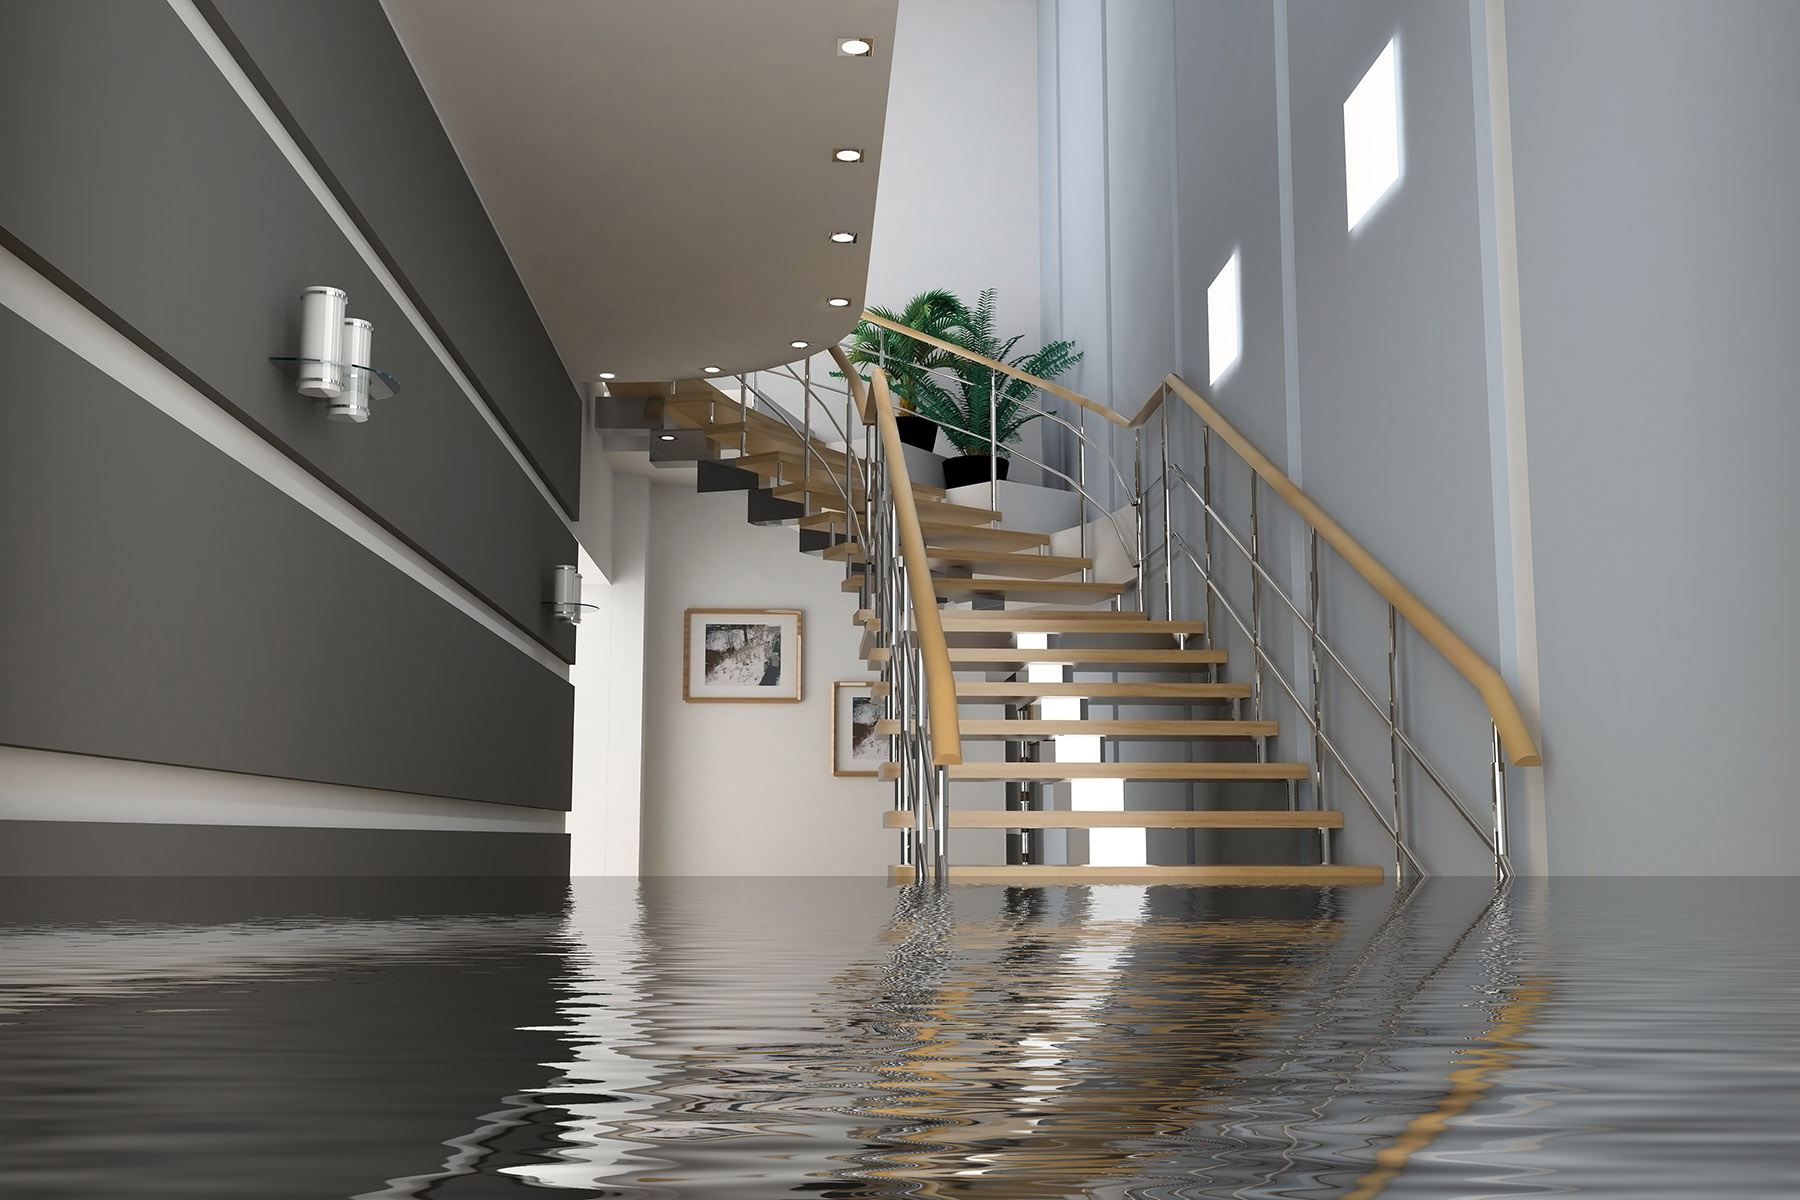 Flood on the main floor in a home